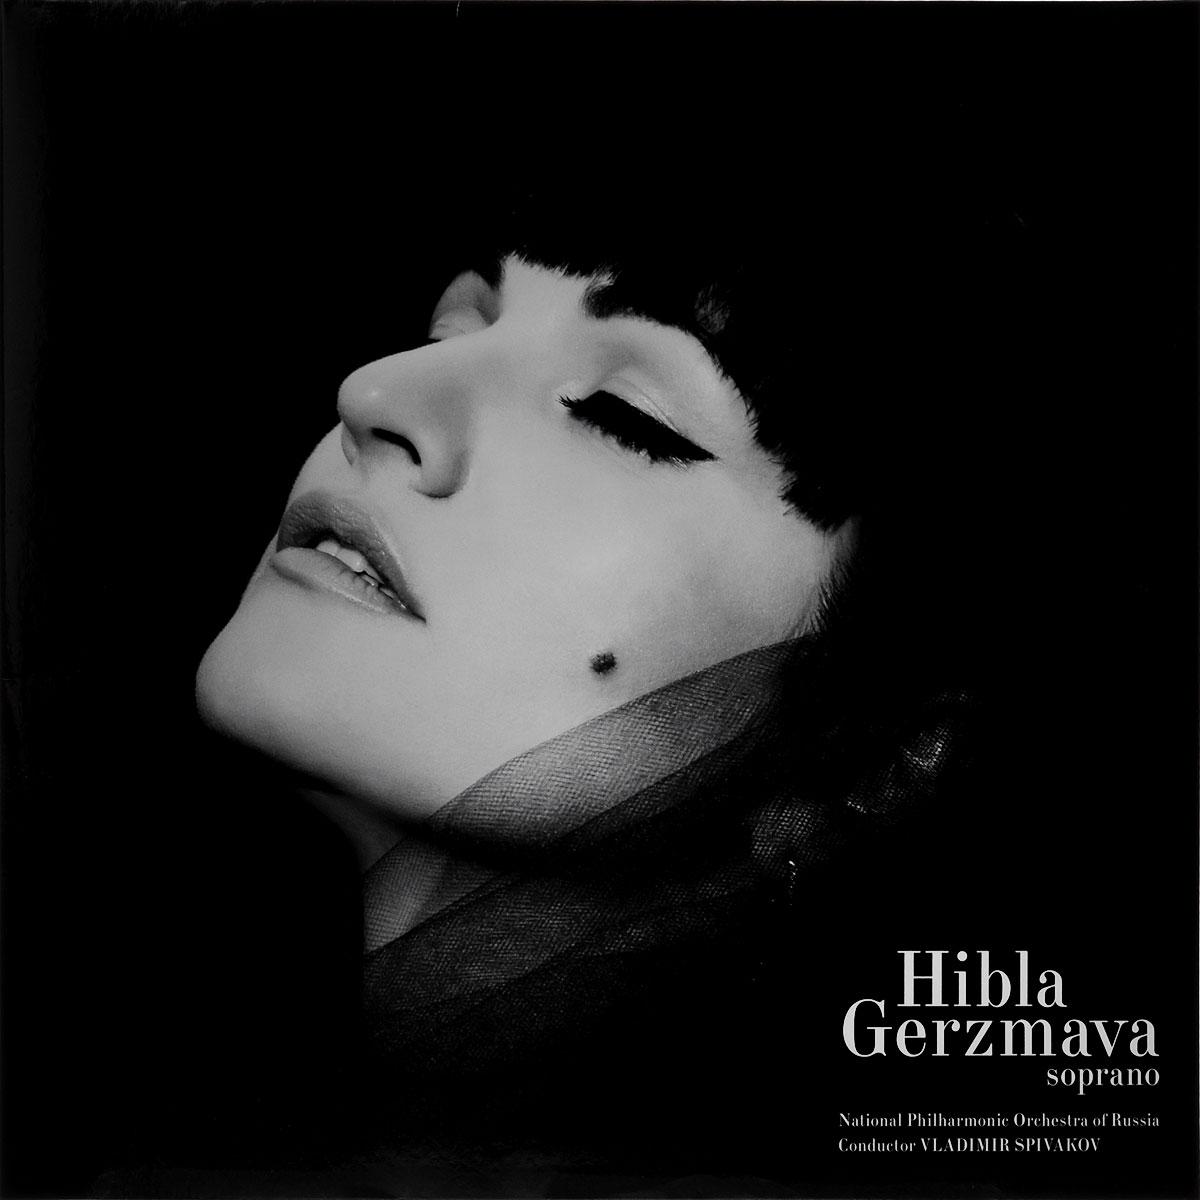 LP 1:Tracks 1 - 3 LP 2:Tracks 4 - 6